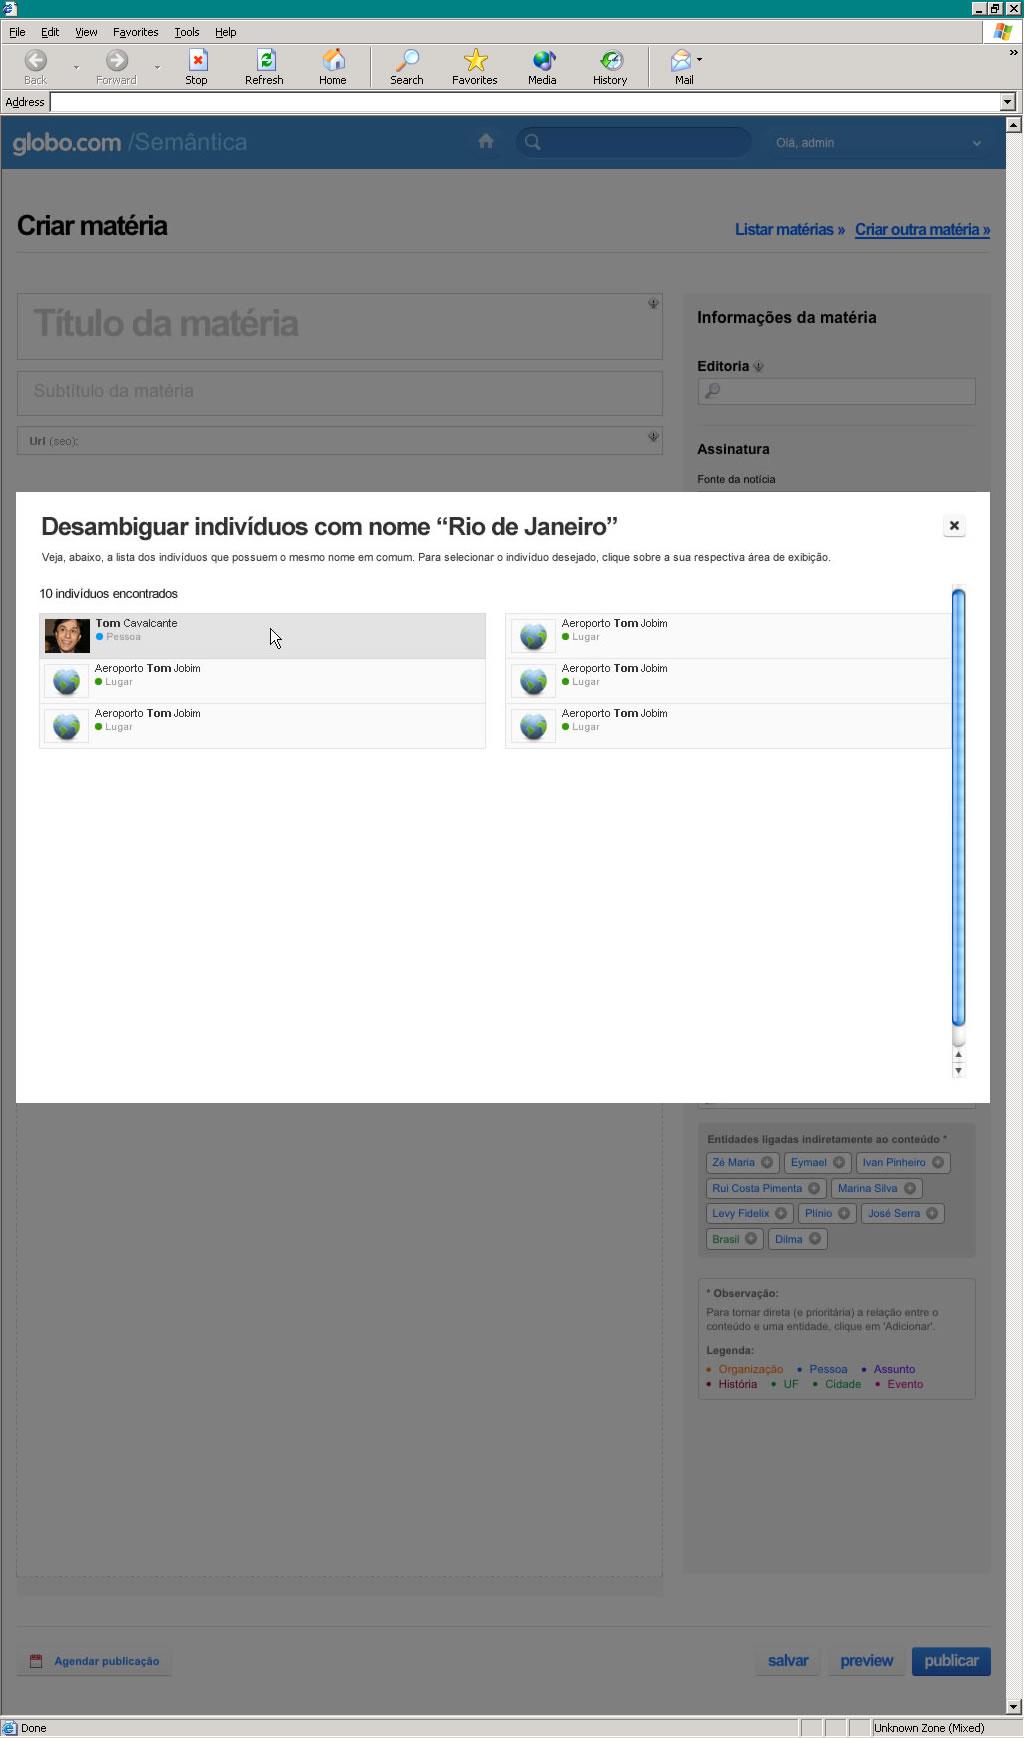 Globo.com's entity extractor tool